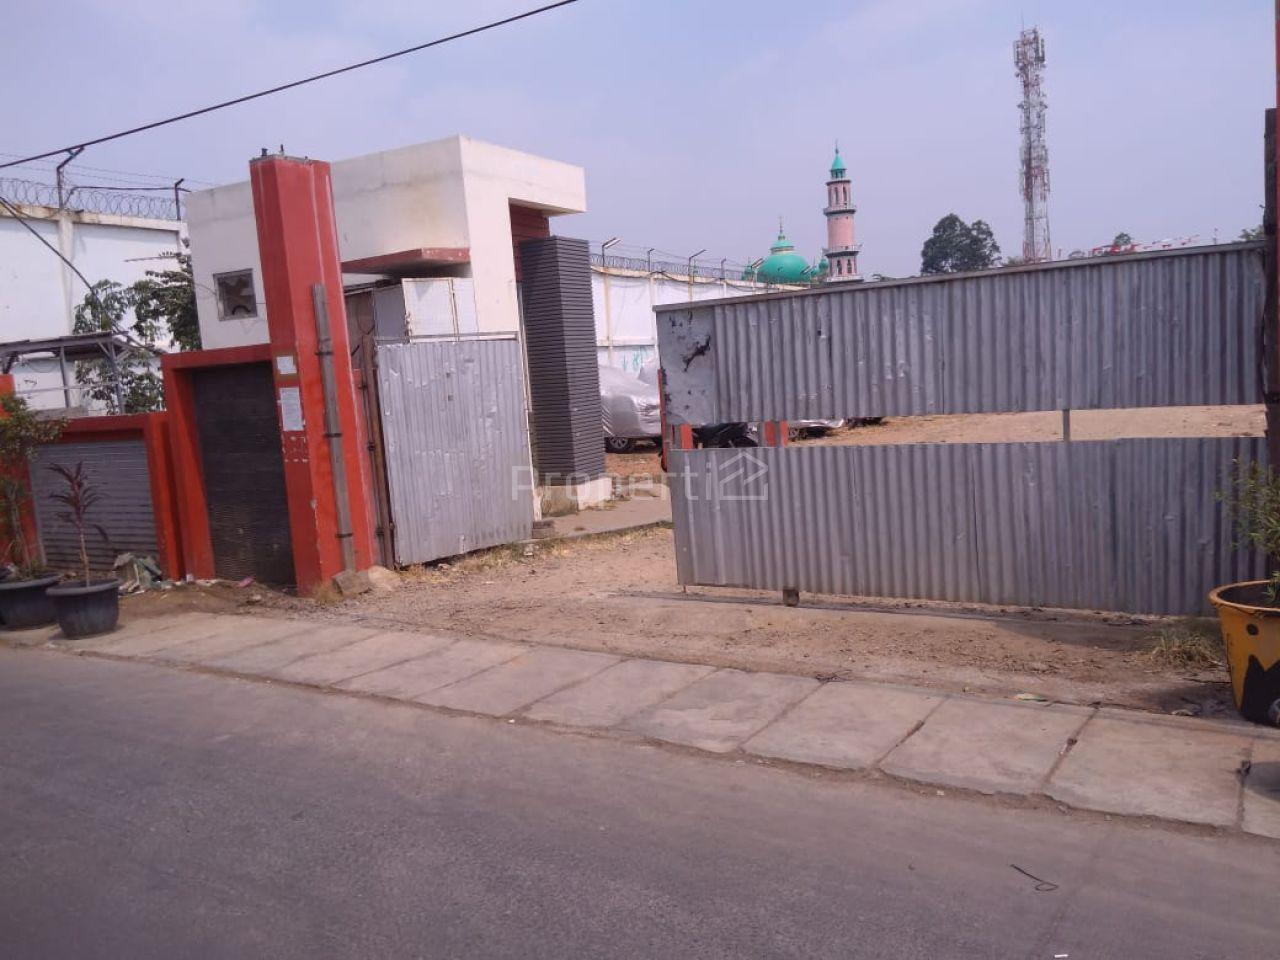 Lahan Peruntukan Perumahan di Cengkareng Timur, DKI Jakarta